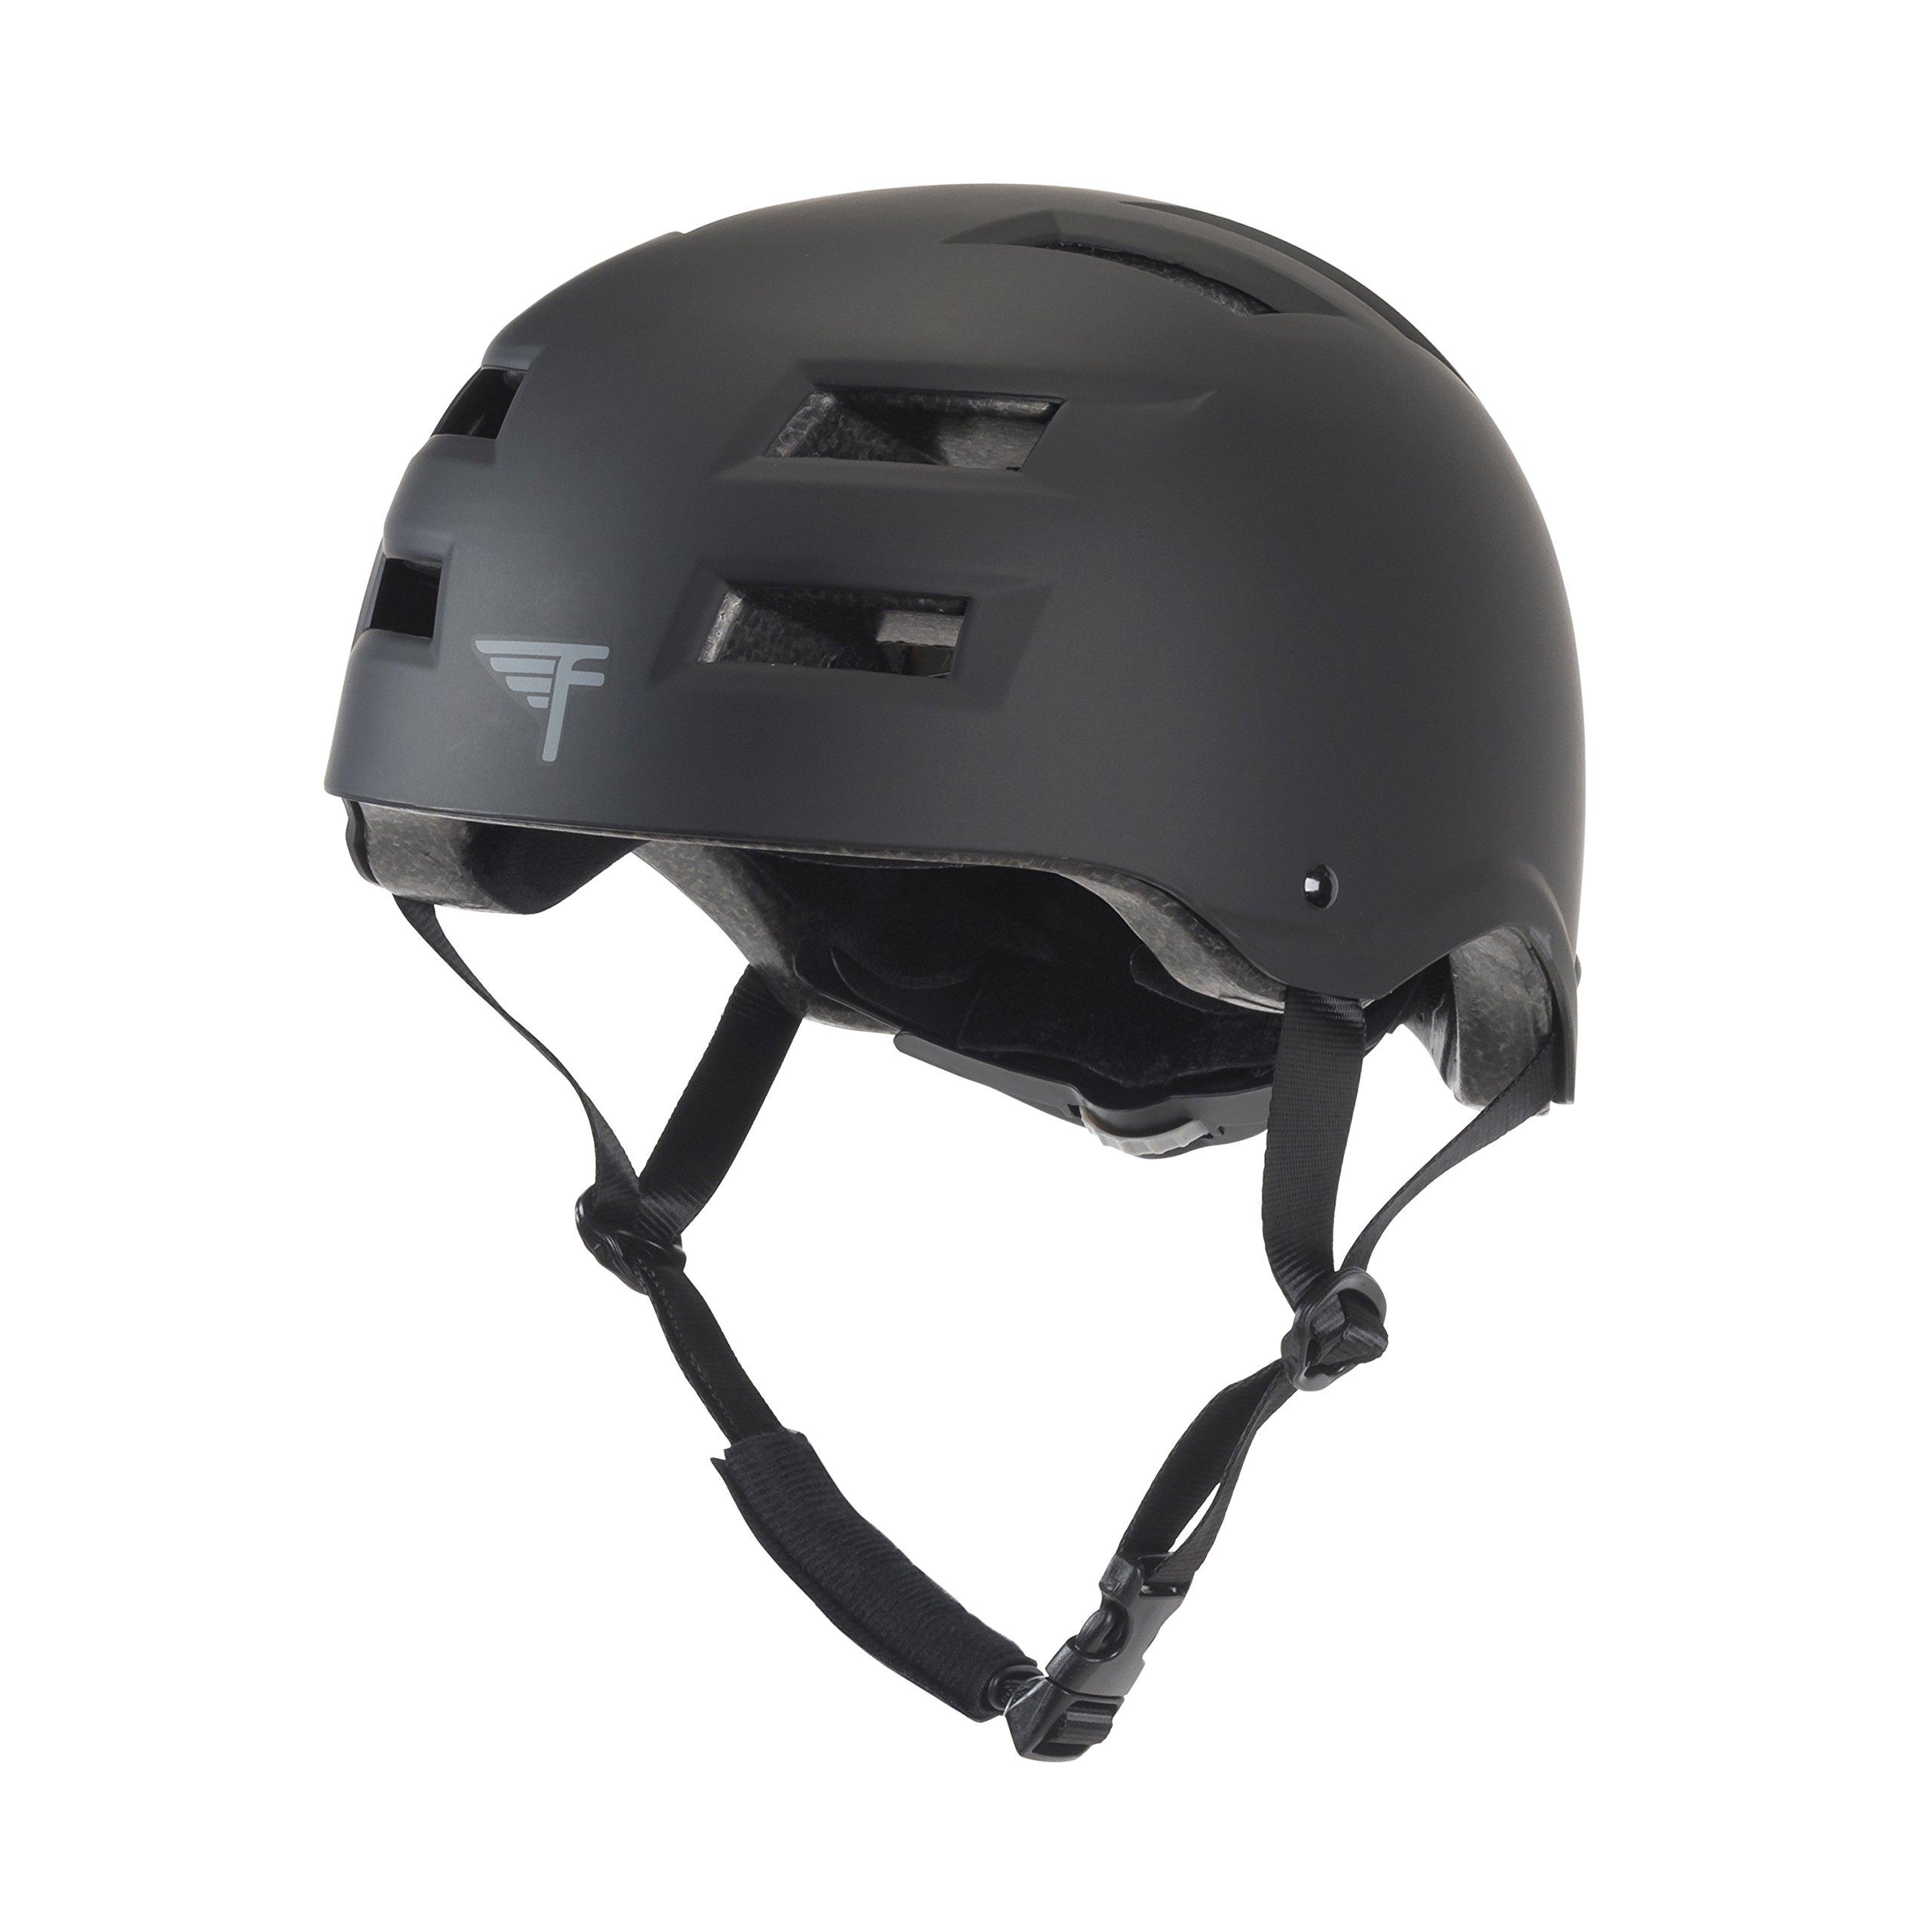 Flybar Protective Multi-Sport Adjustable Helmet,Black,S/M by Flybar